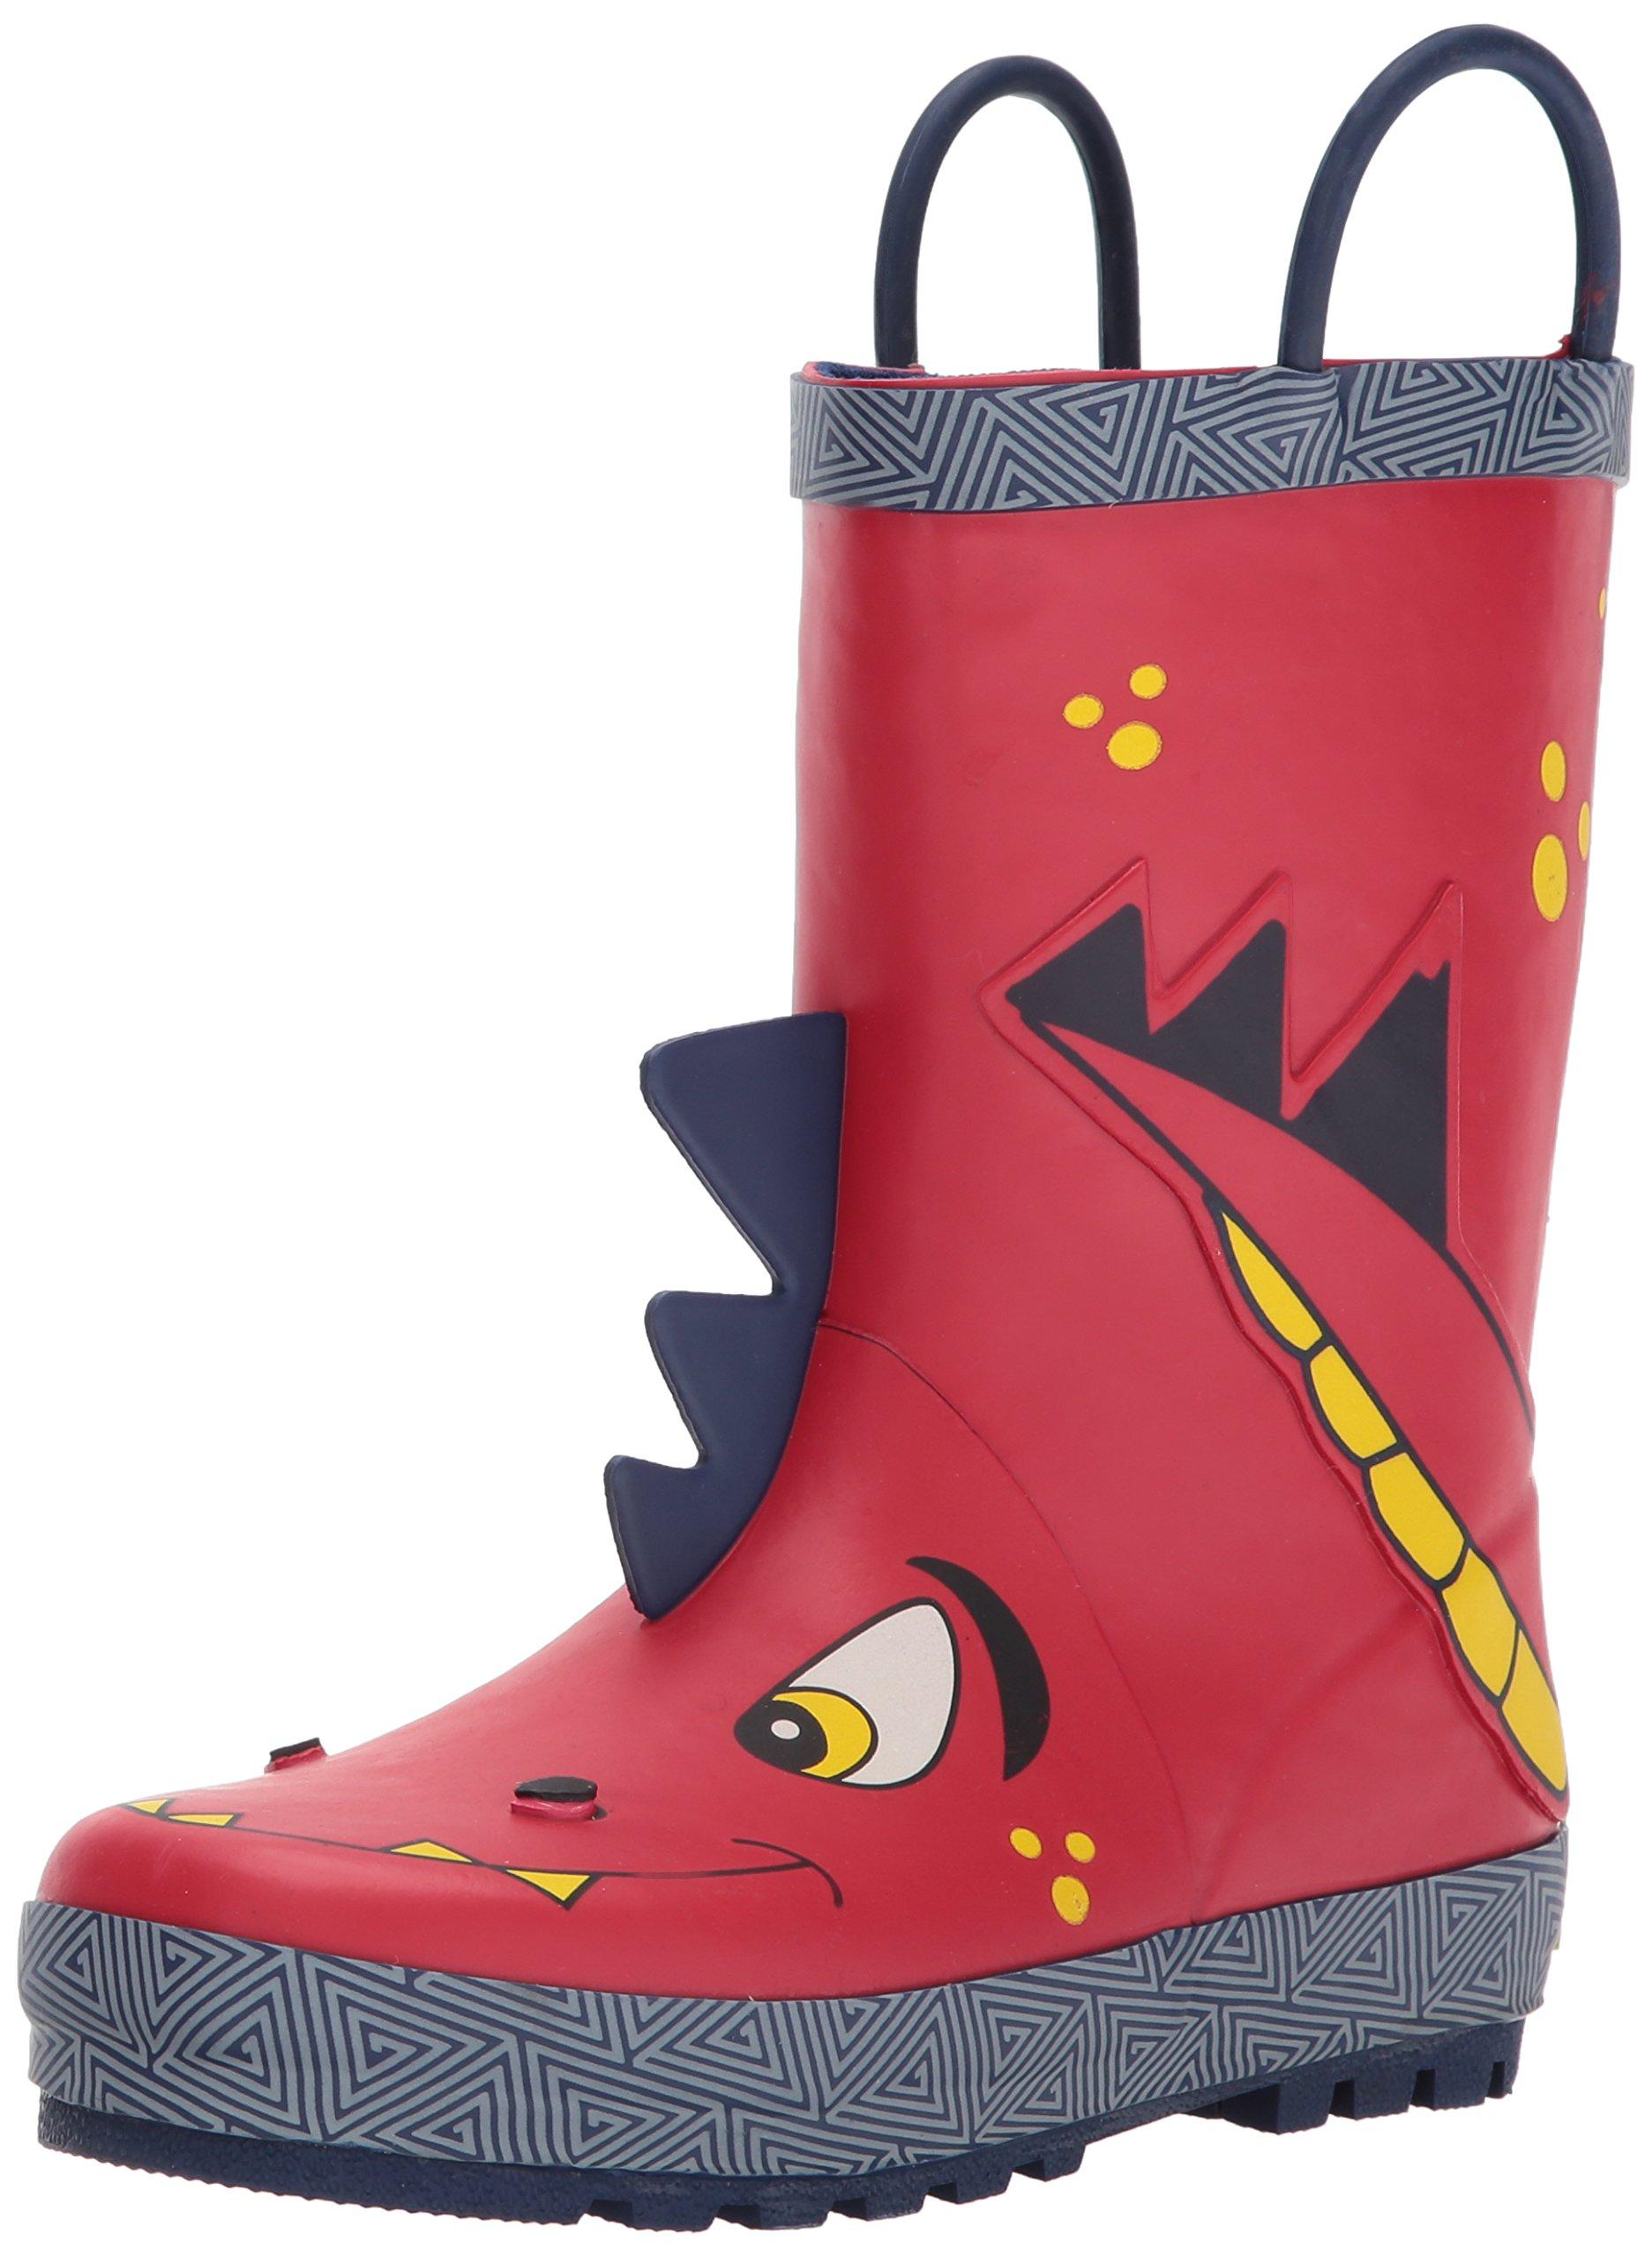 Western Chief Boys Waterproof Printed Rain Boot with Easy Pull On Handles, Spike, 13 M US Little Kid